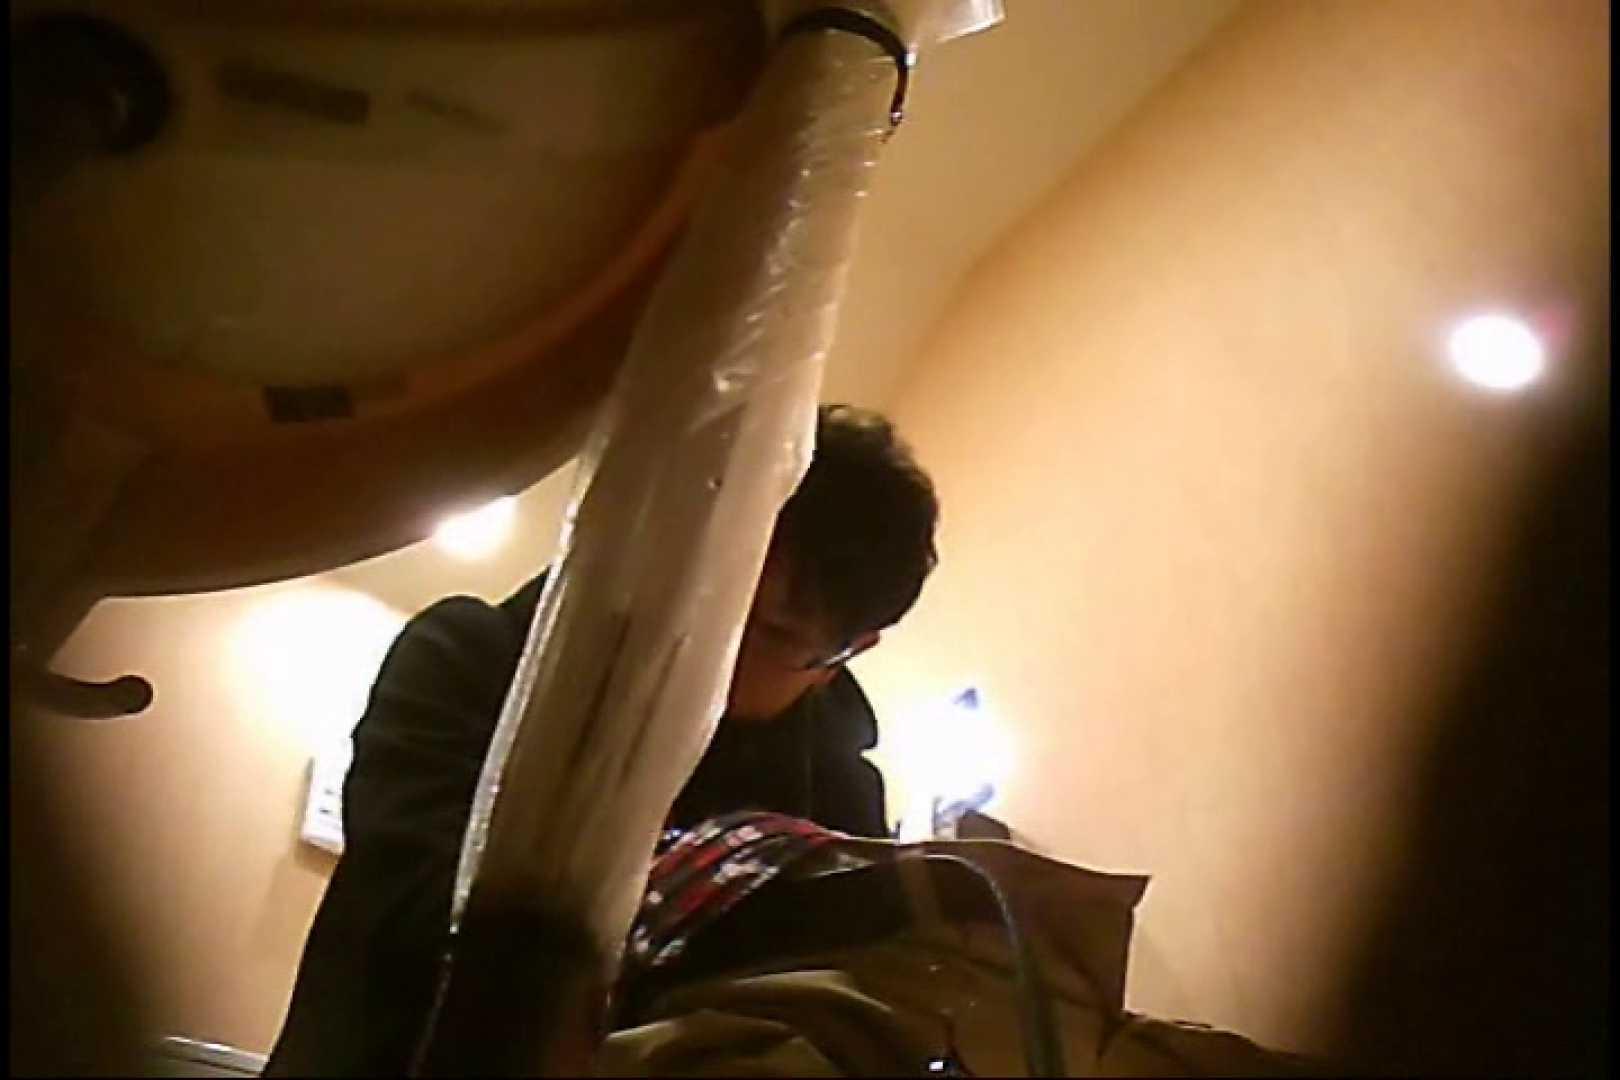 Gボーイ初投稿!掴み取りさんの洗面所覗き!in新幹線!VOL.06 スーツ男子  101枚 60